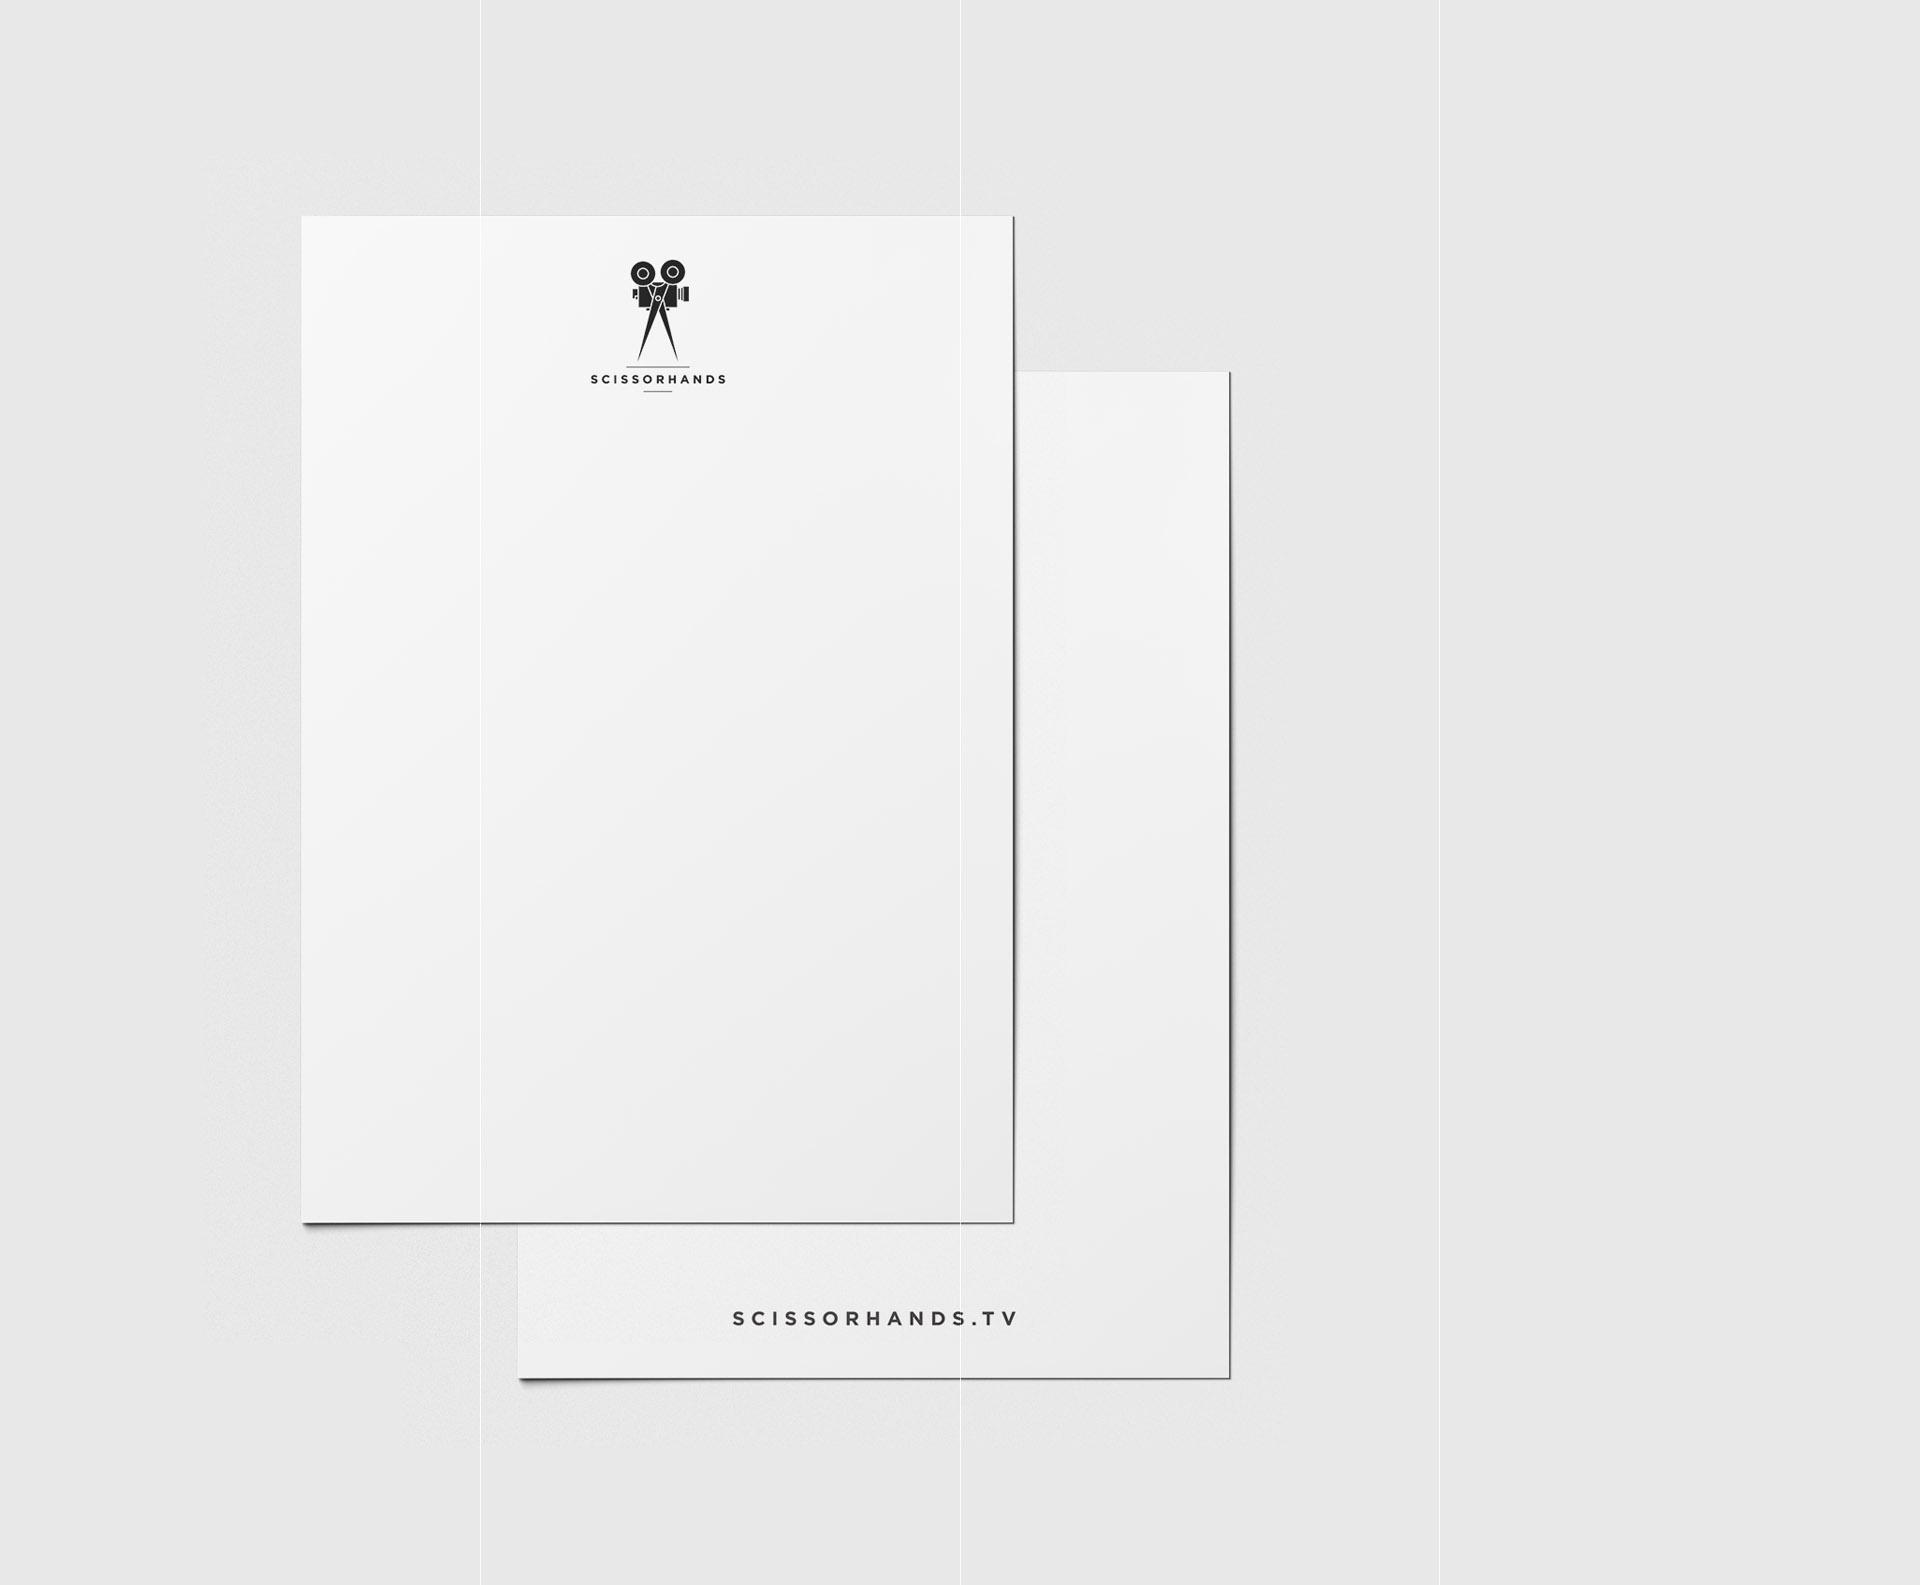 Scissorhands letterhead design